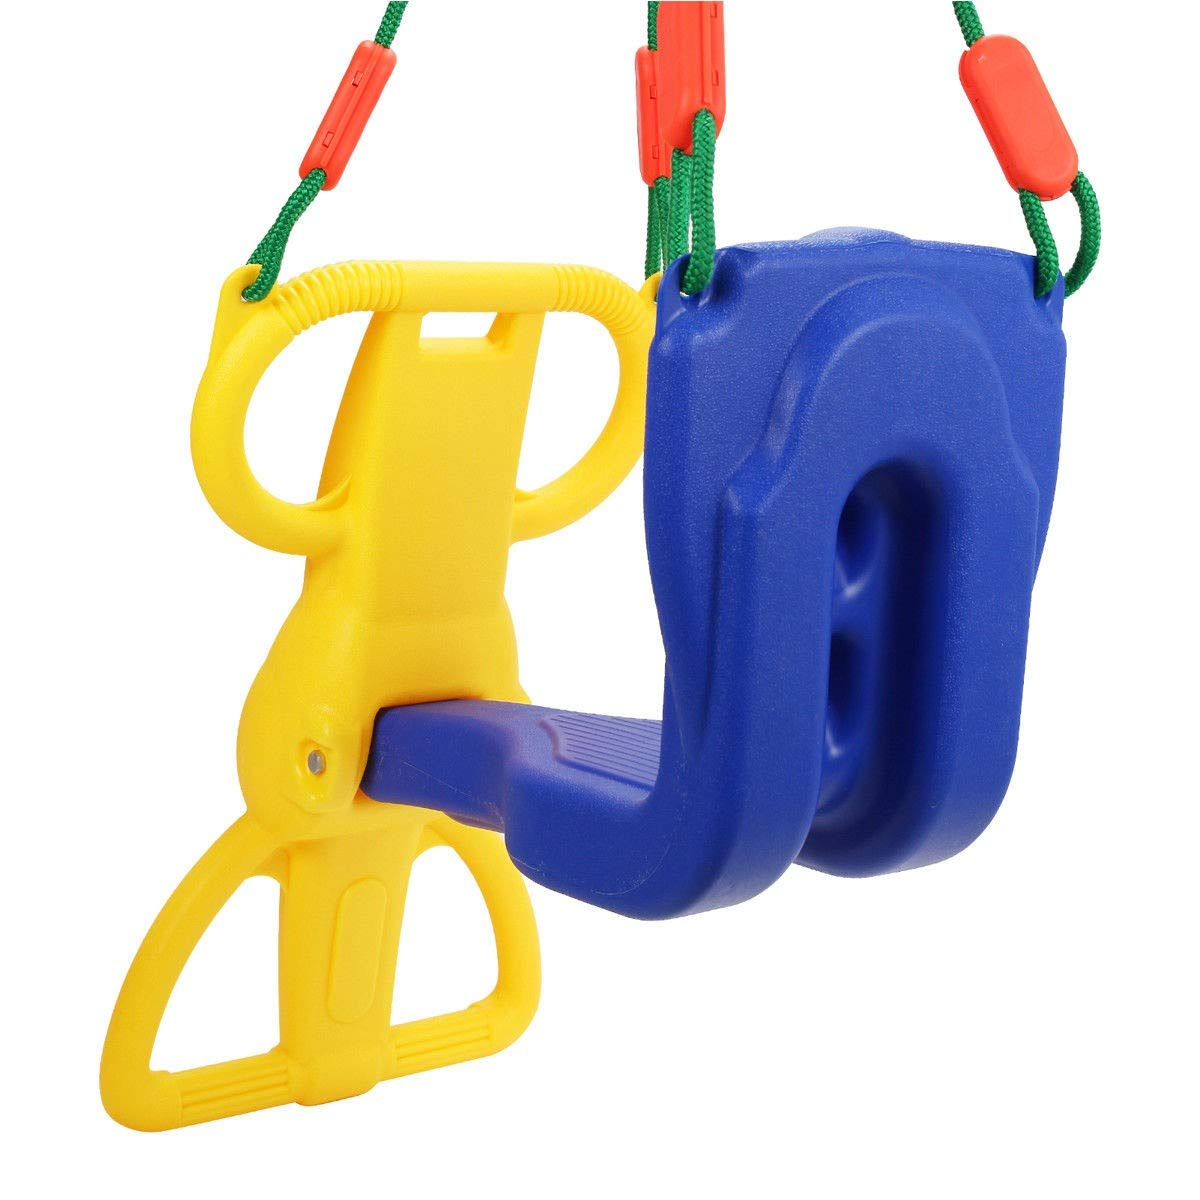 Backyard Kids Rider Glider Swing with Hangers by Apontus (Image #5)